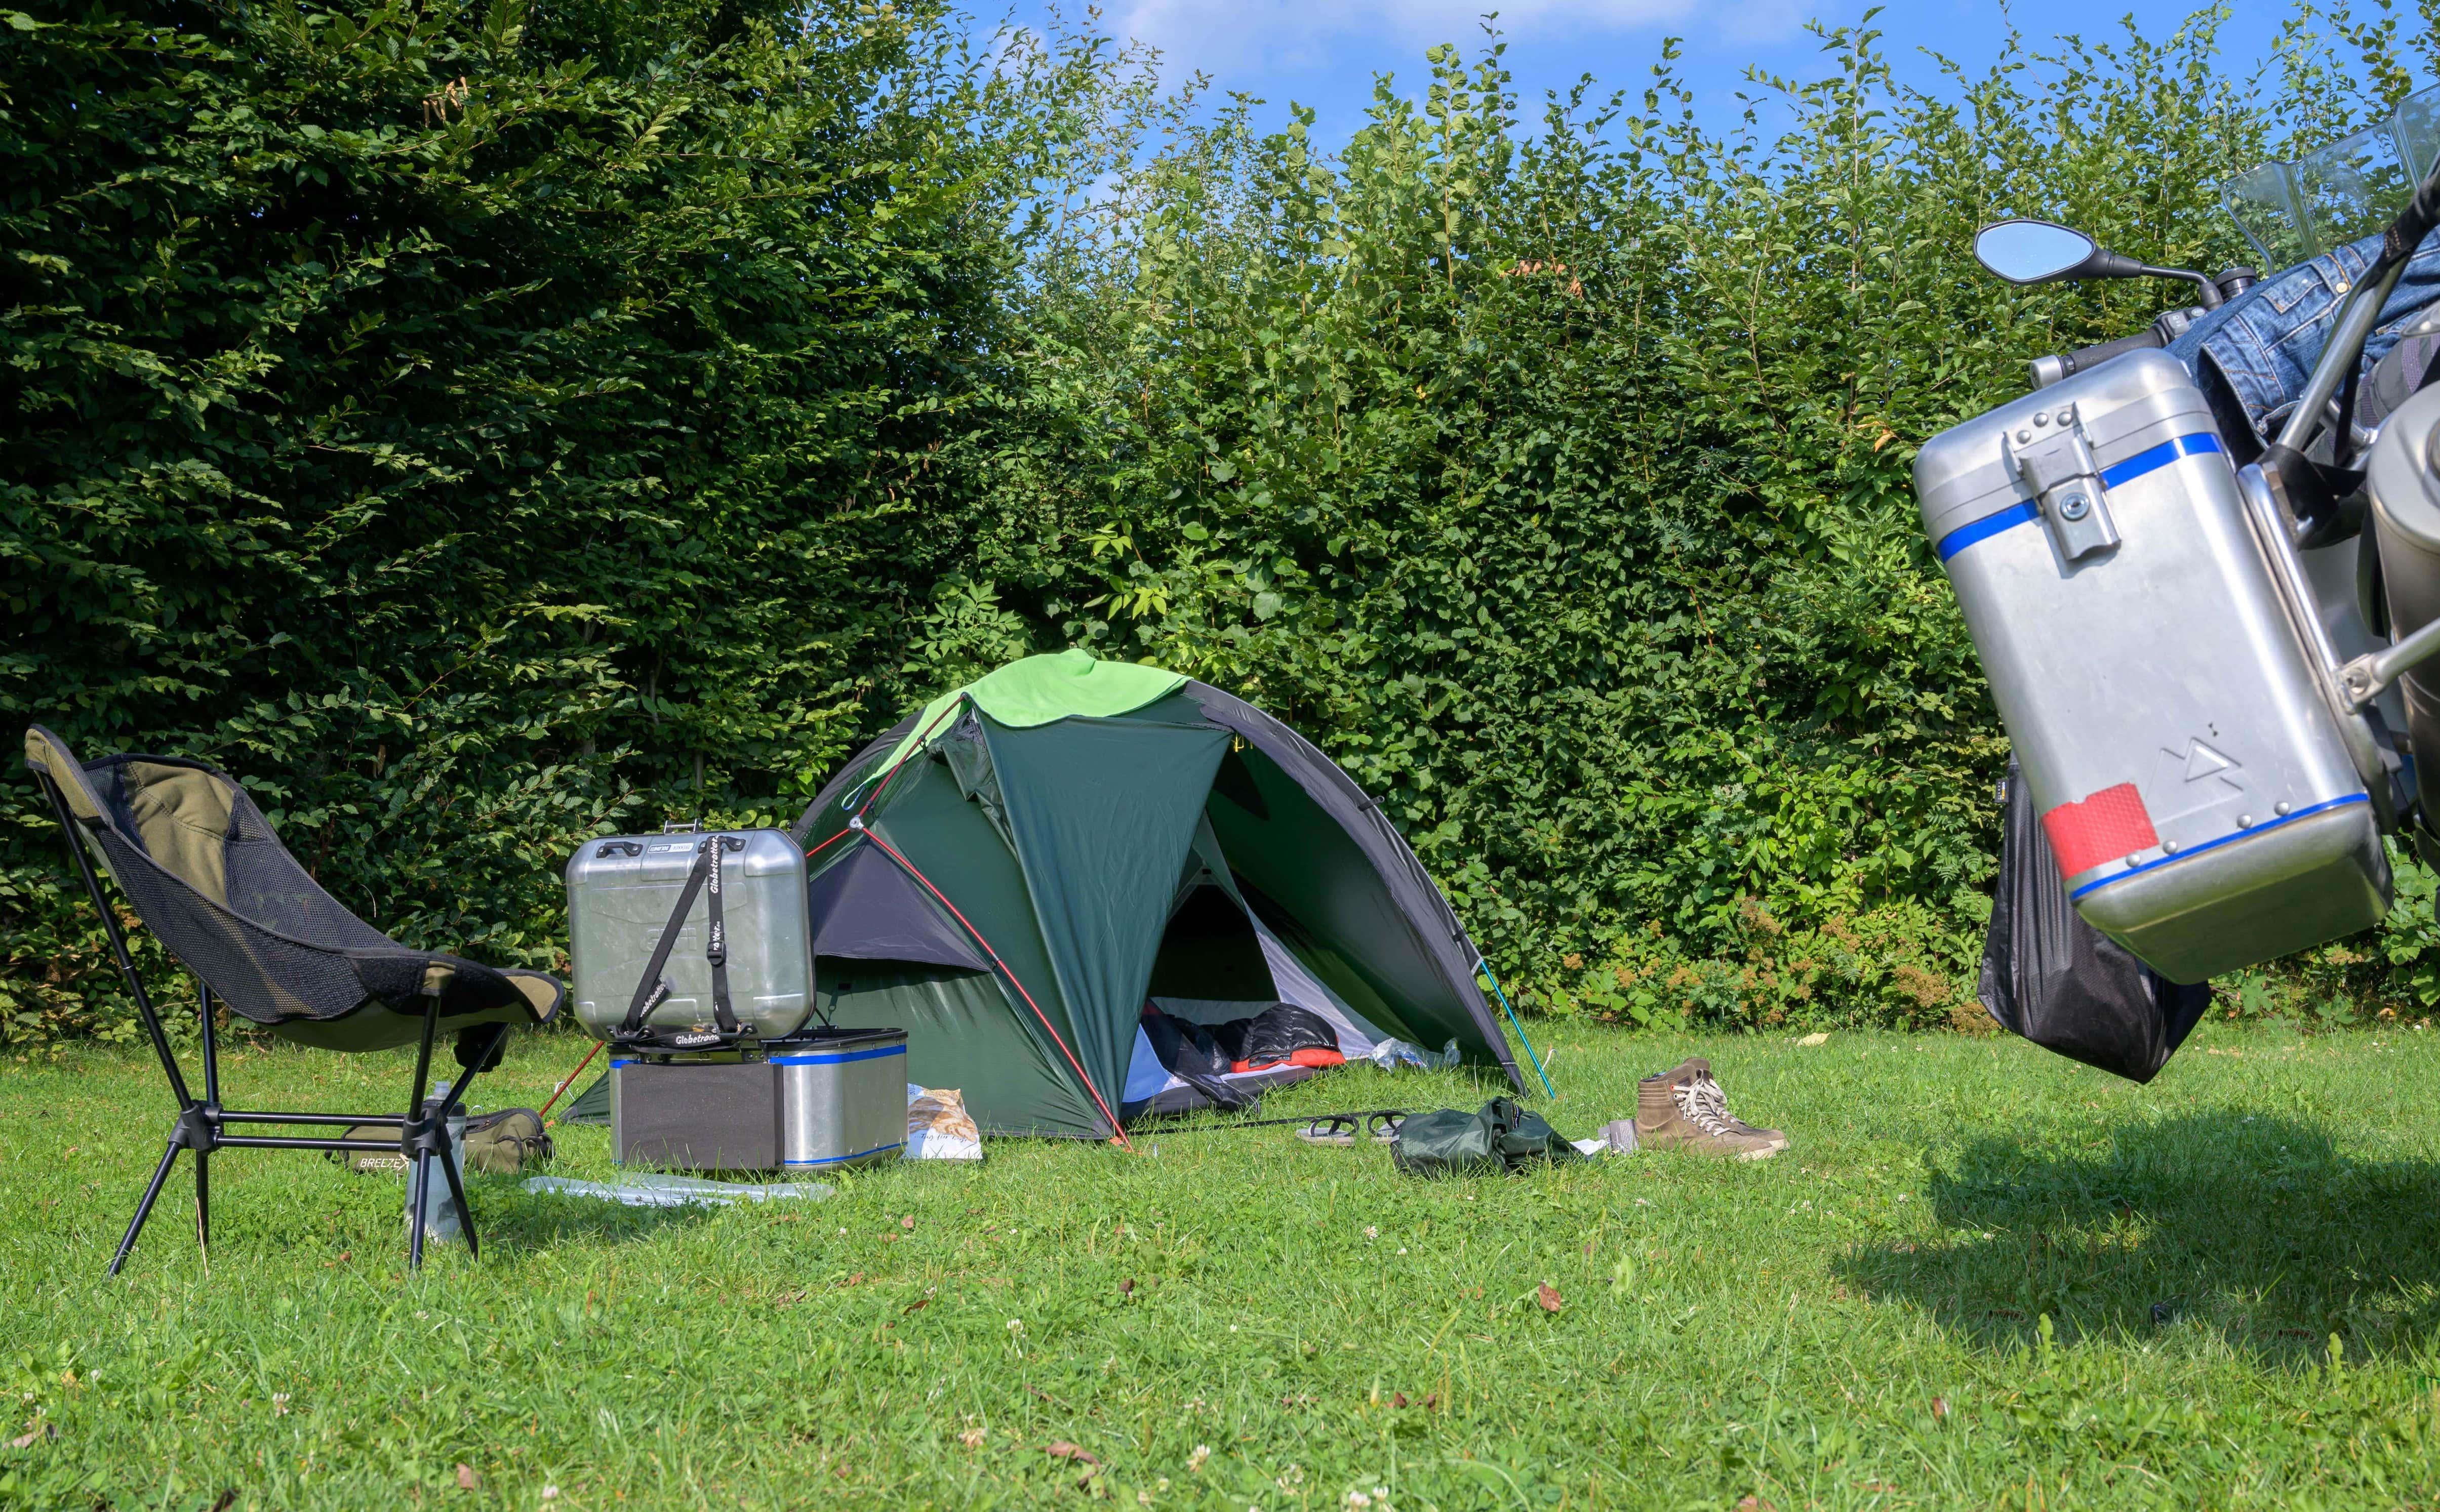 Emplacement - Emplacement Tente Moyenne, Sans Voiture - Nibelungen-Camping am Schwimmbad